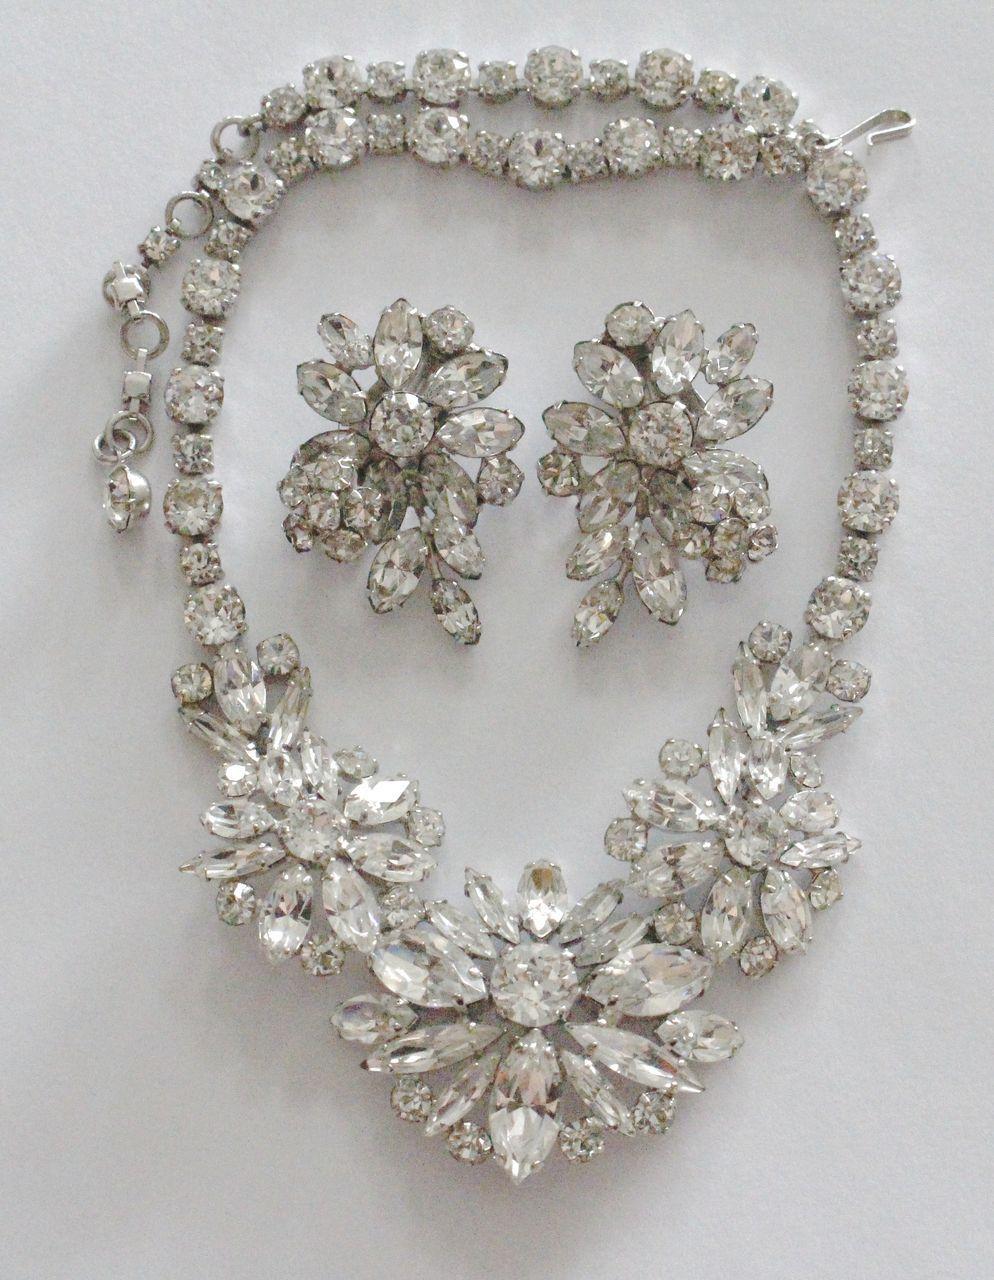 Sherman Swarovski Crystal Rhinestone Floral Necklace & Earrings